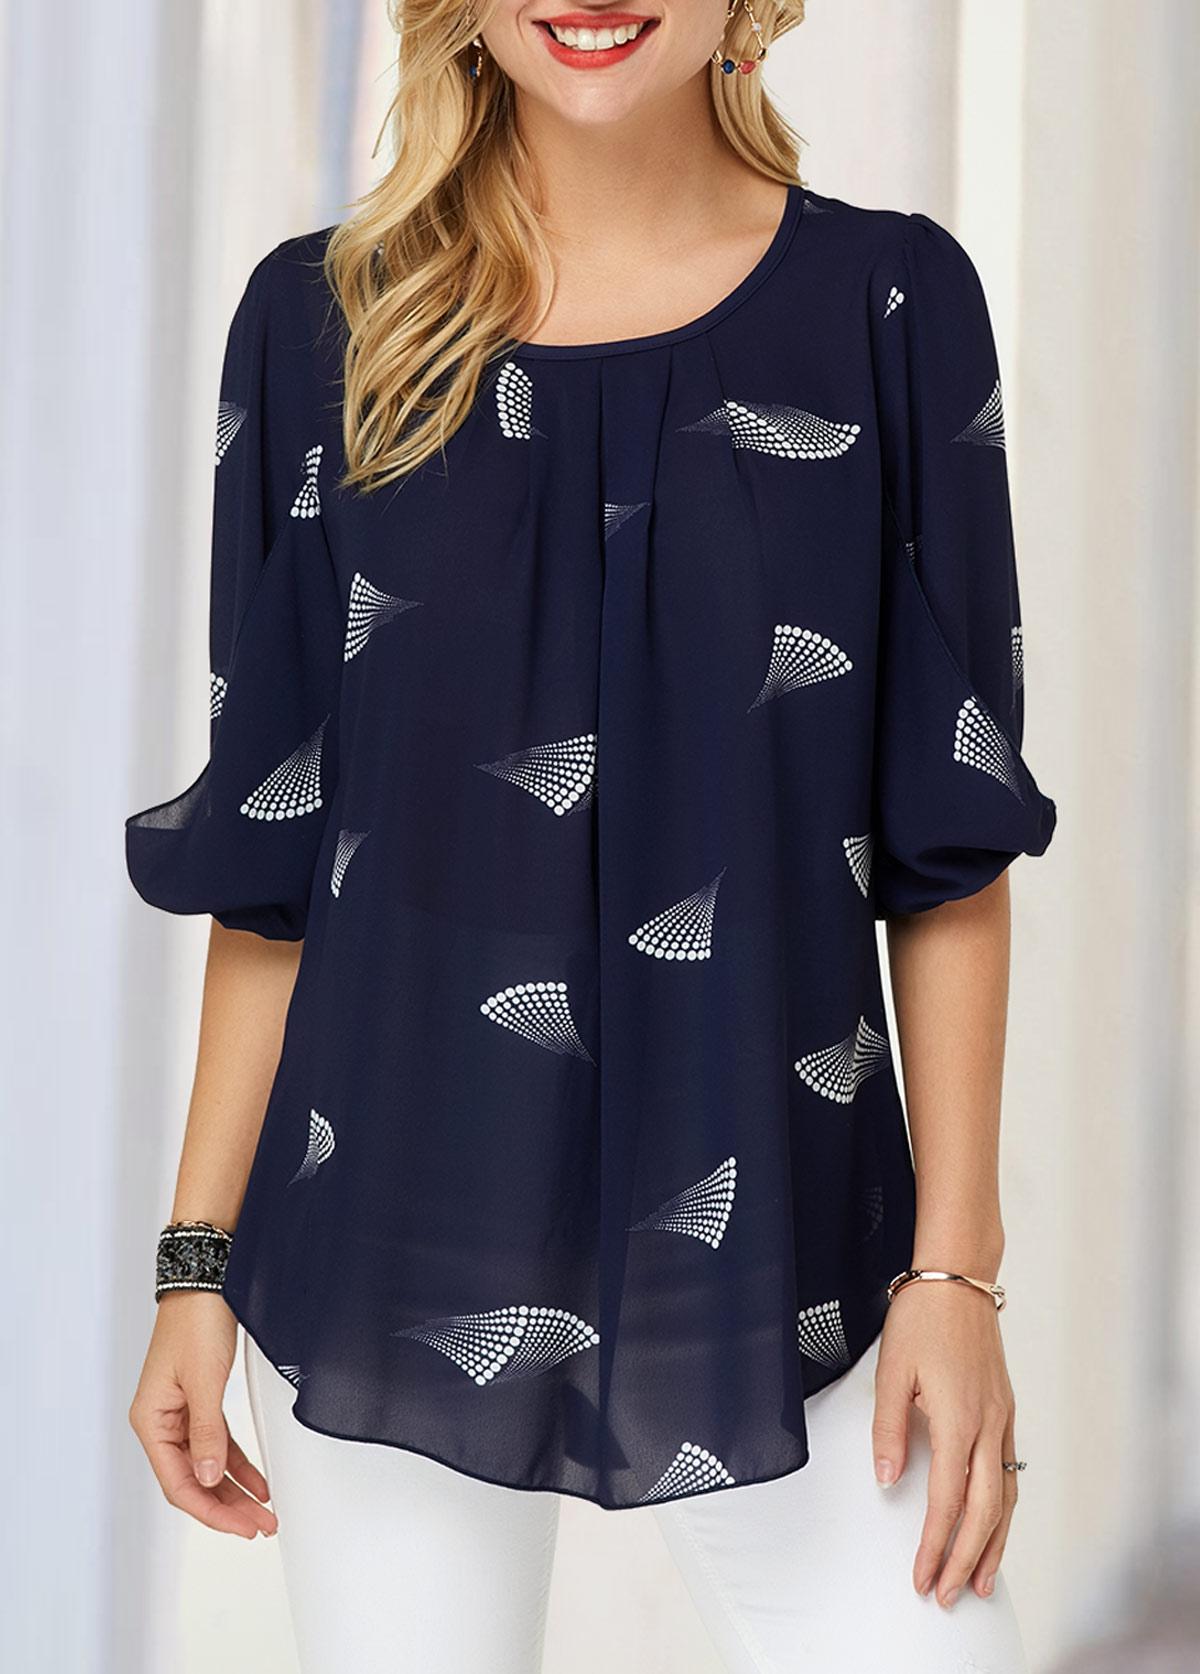 Printed Blouson Sleeve Navy Blue Blouse